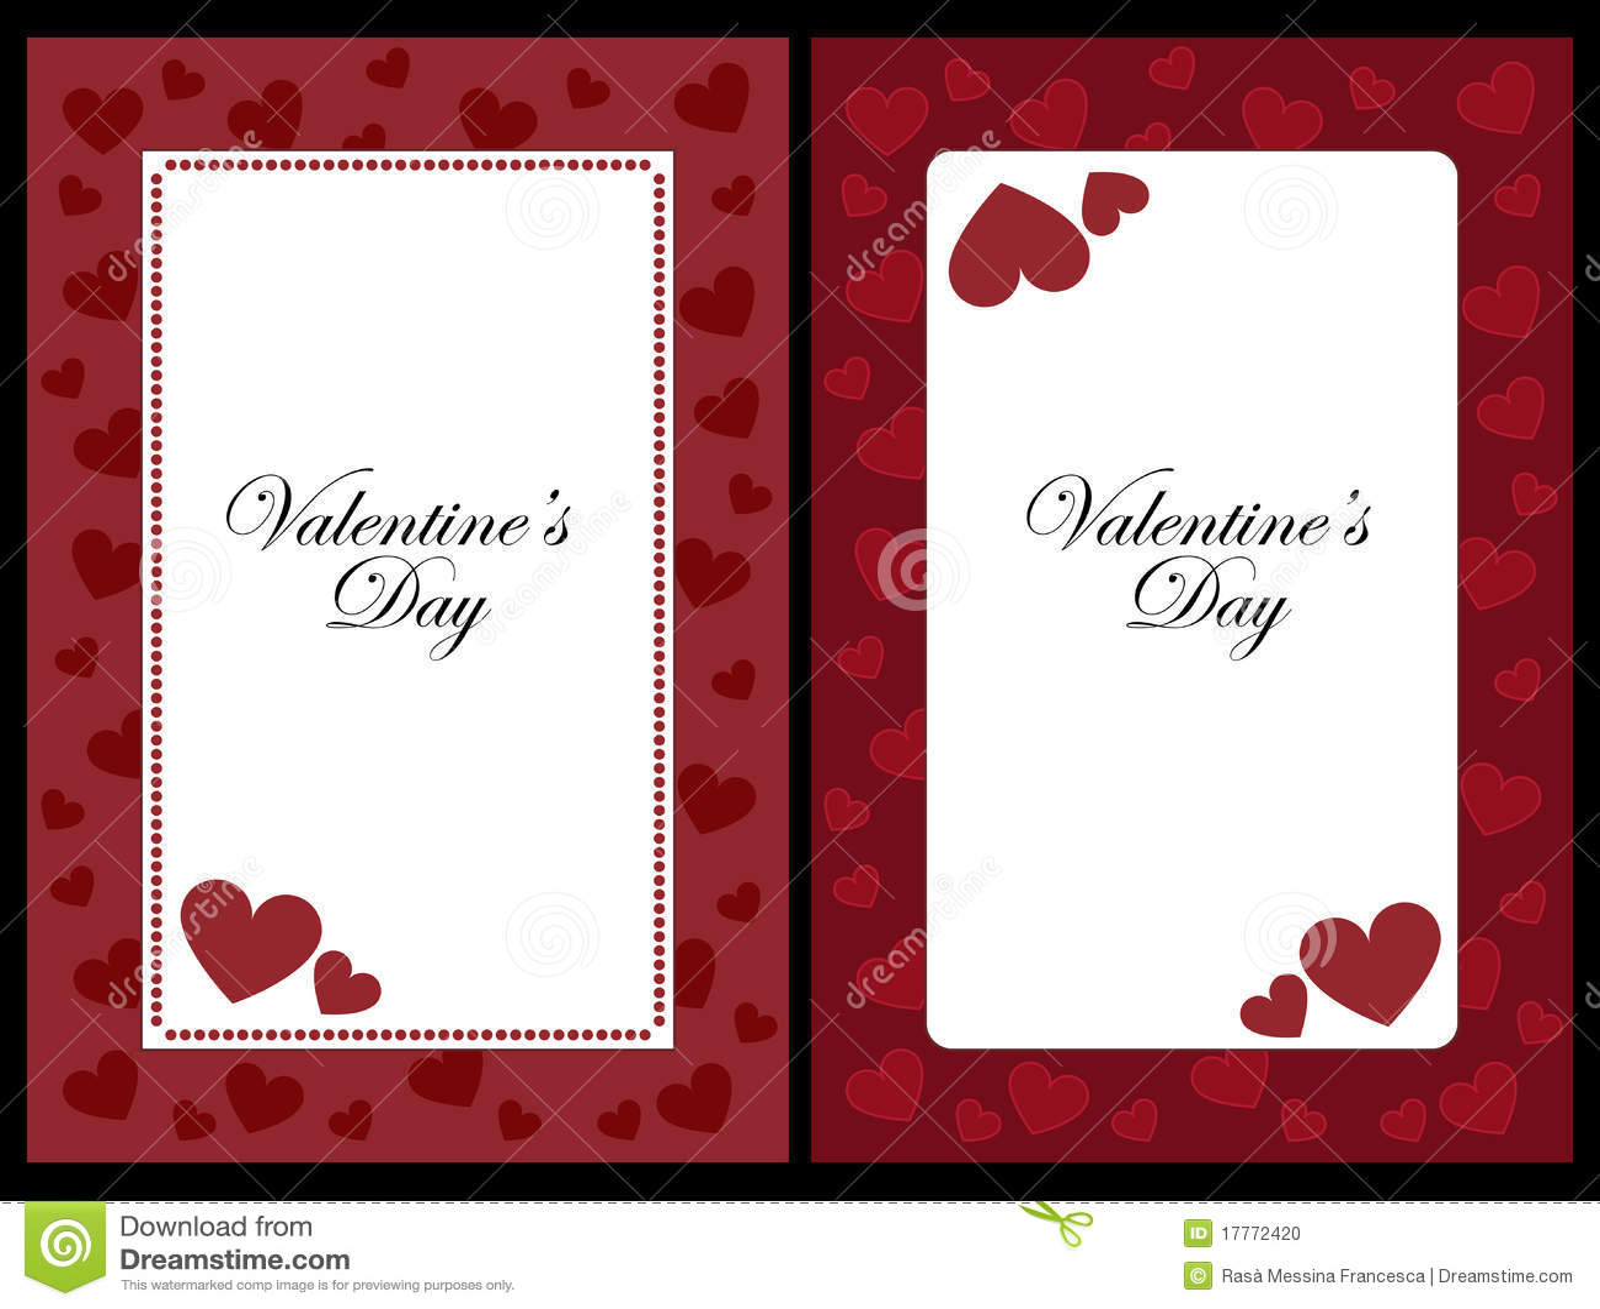 Valentine Frames Stock Vector Illustration Of Artistic